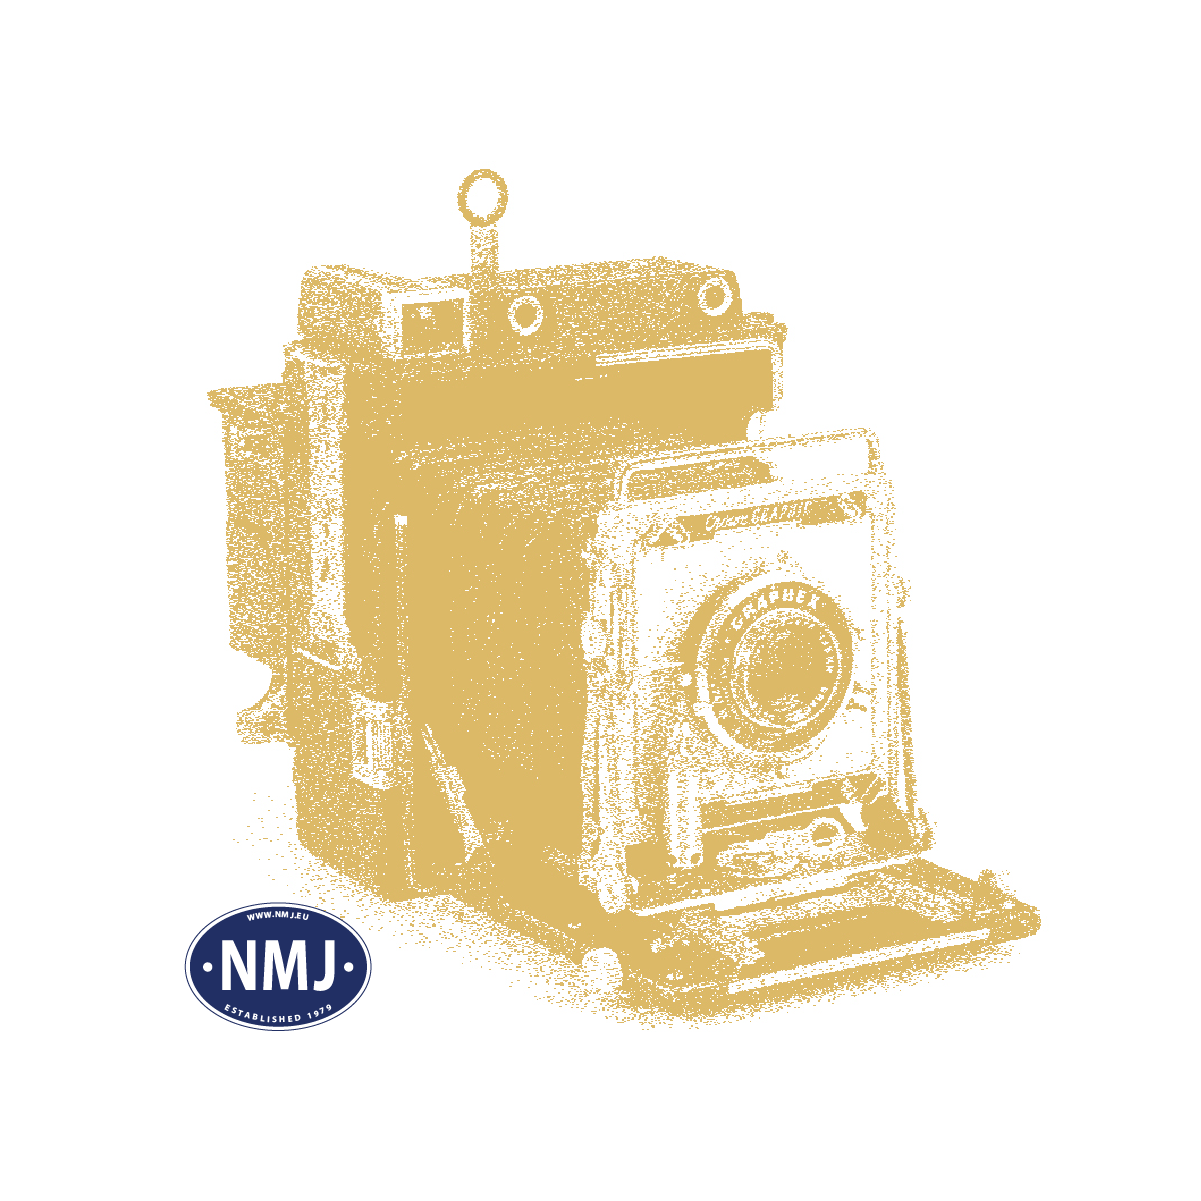 NMJT86.301AC - NMJ Topline NSB El11.2089, Mellomdesign, AC Digital